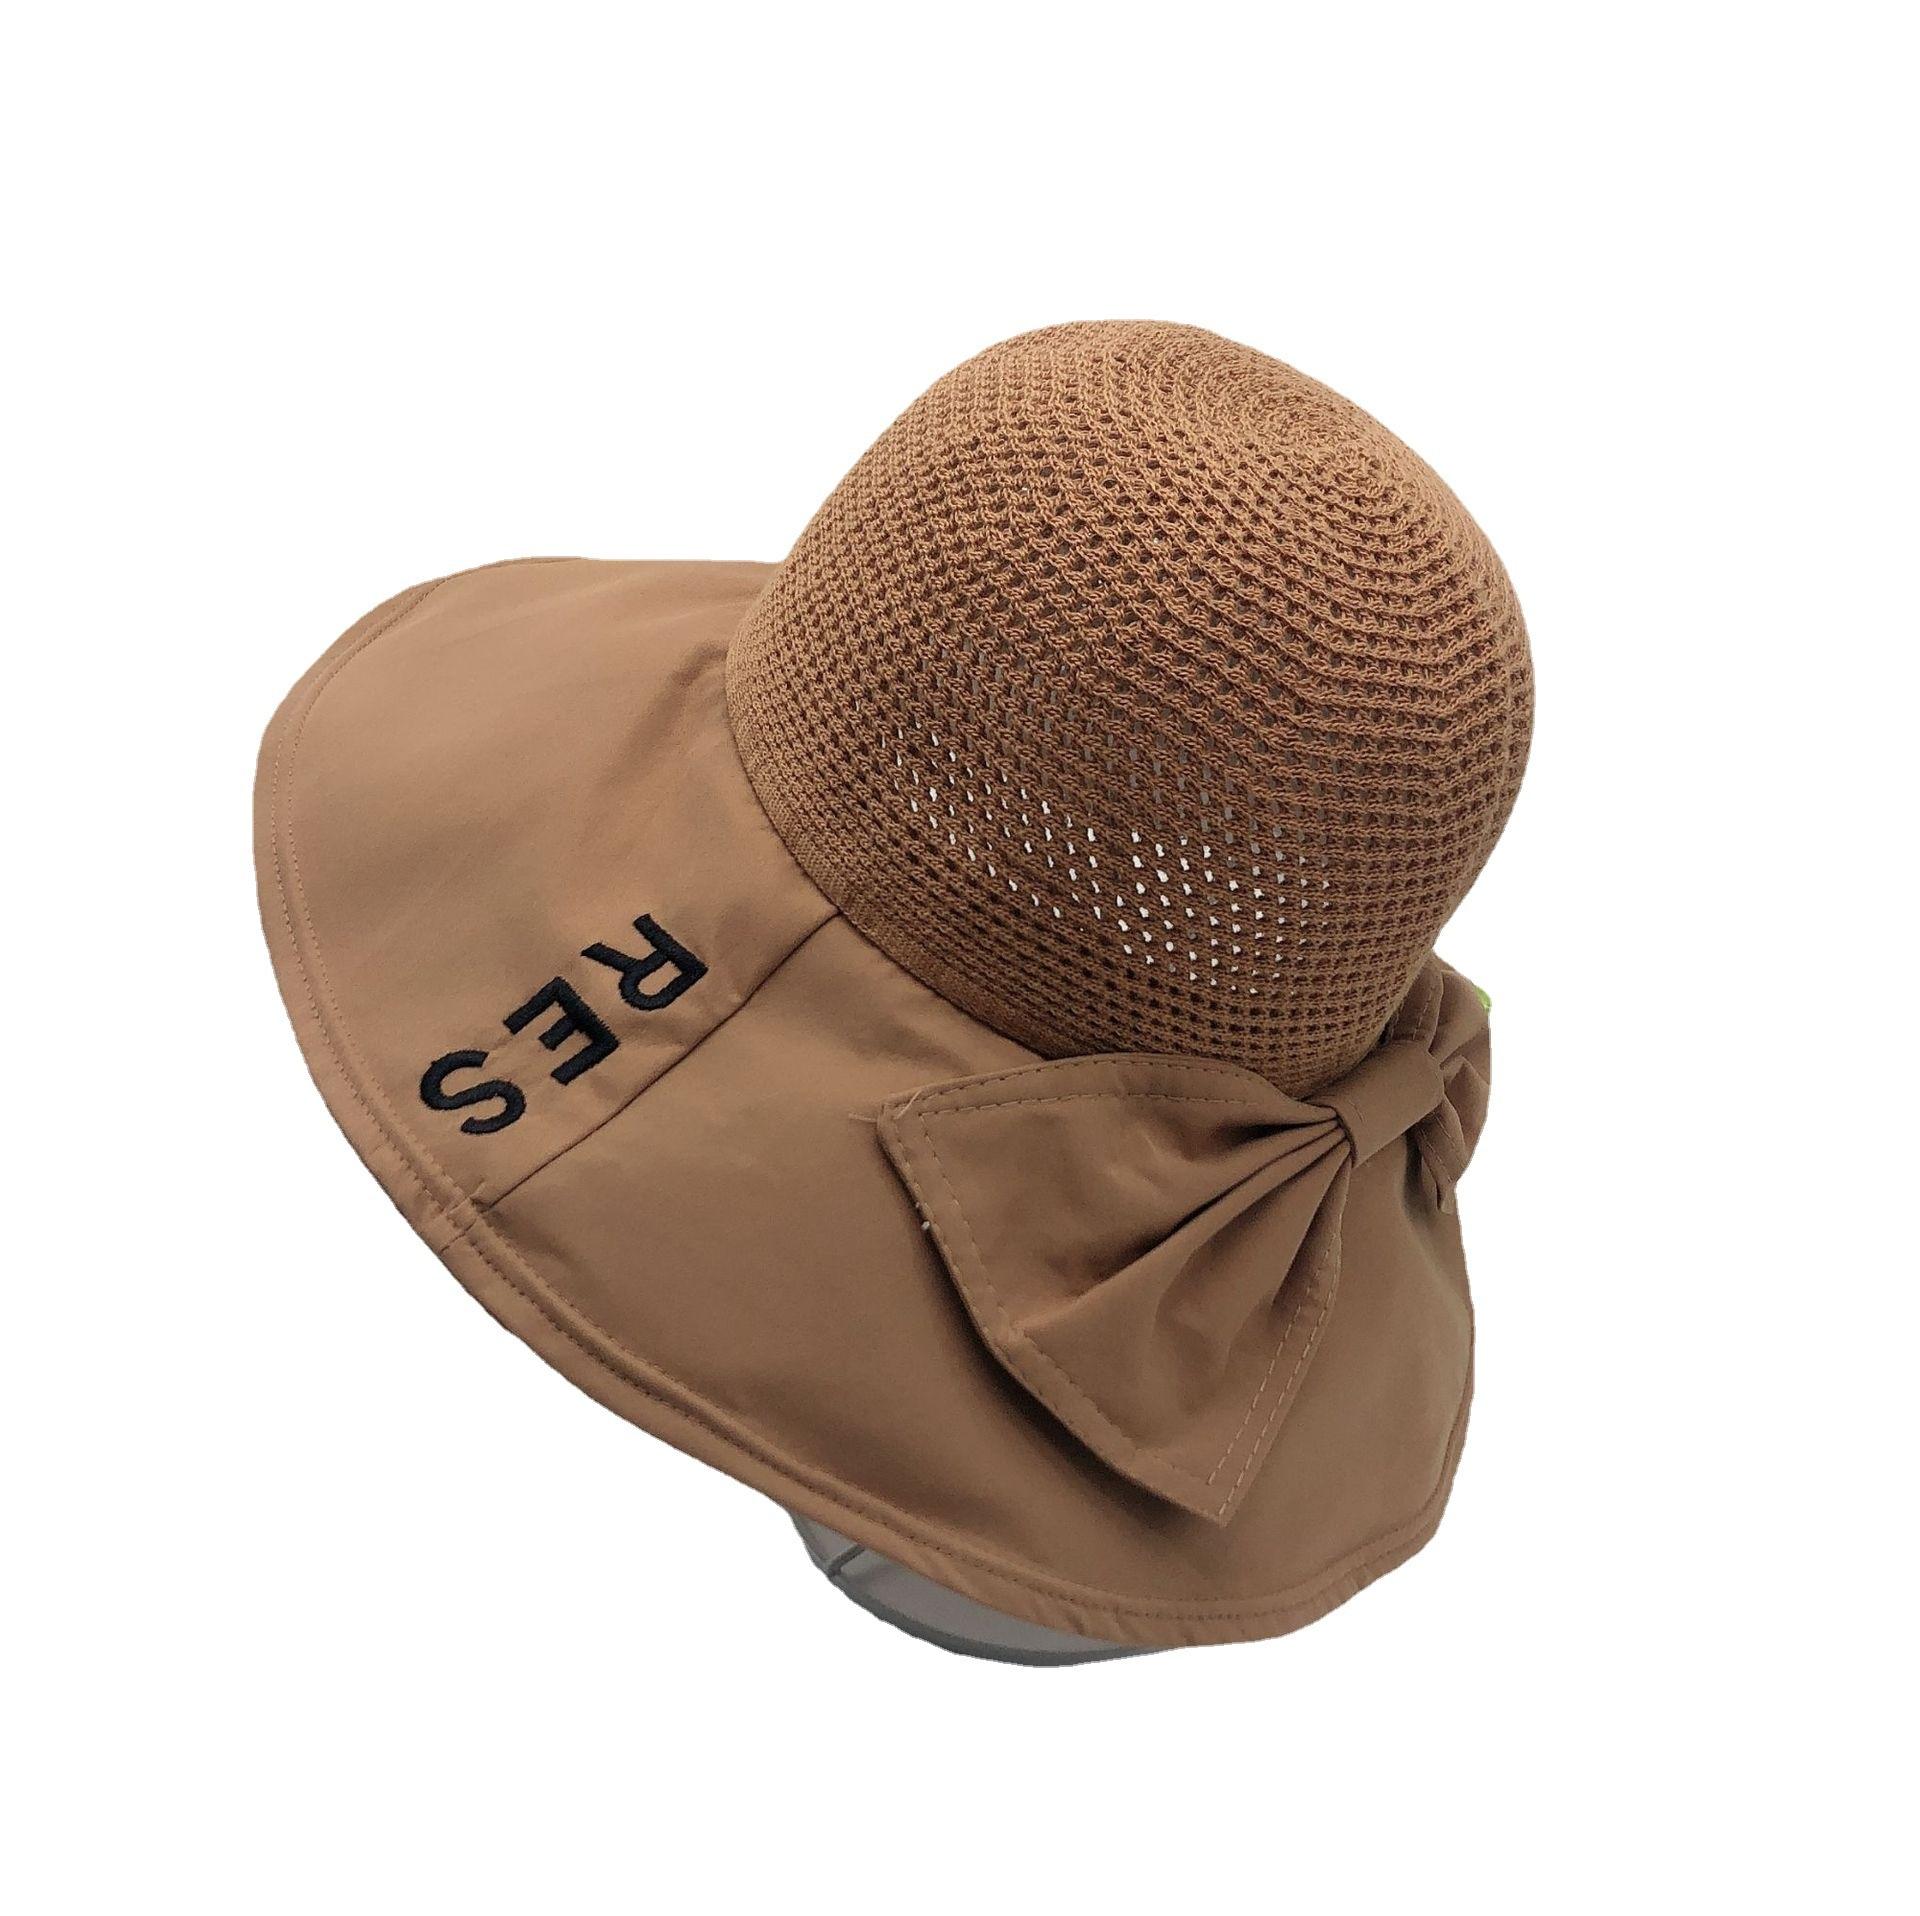 Women's sunscreen bow breathable fisherman's hat sun hat sunshade